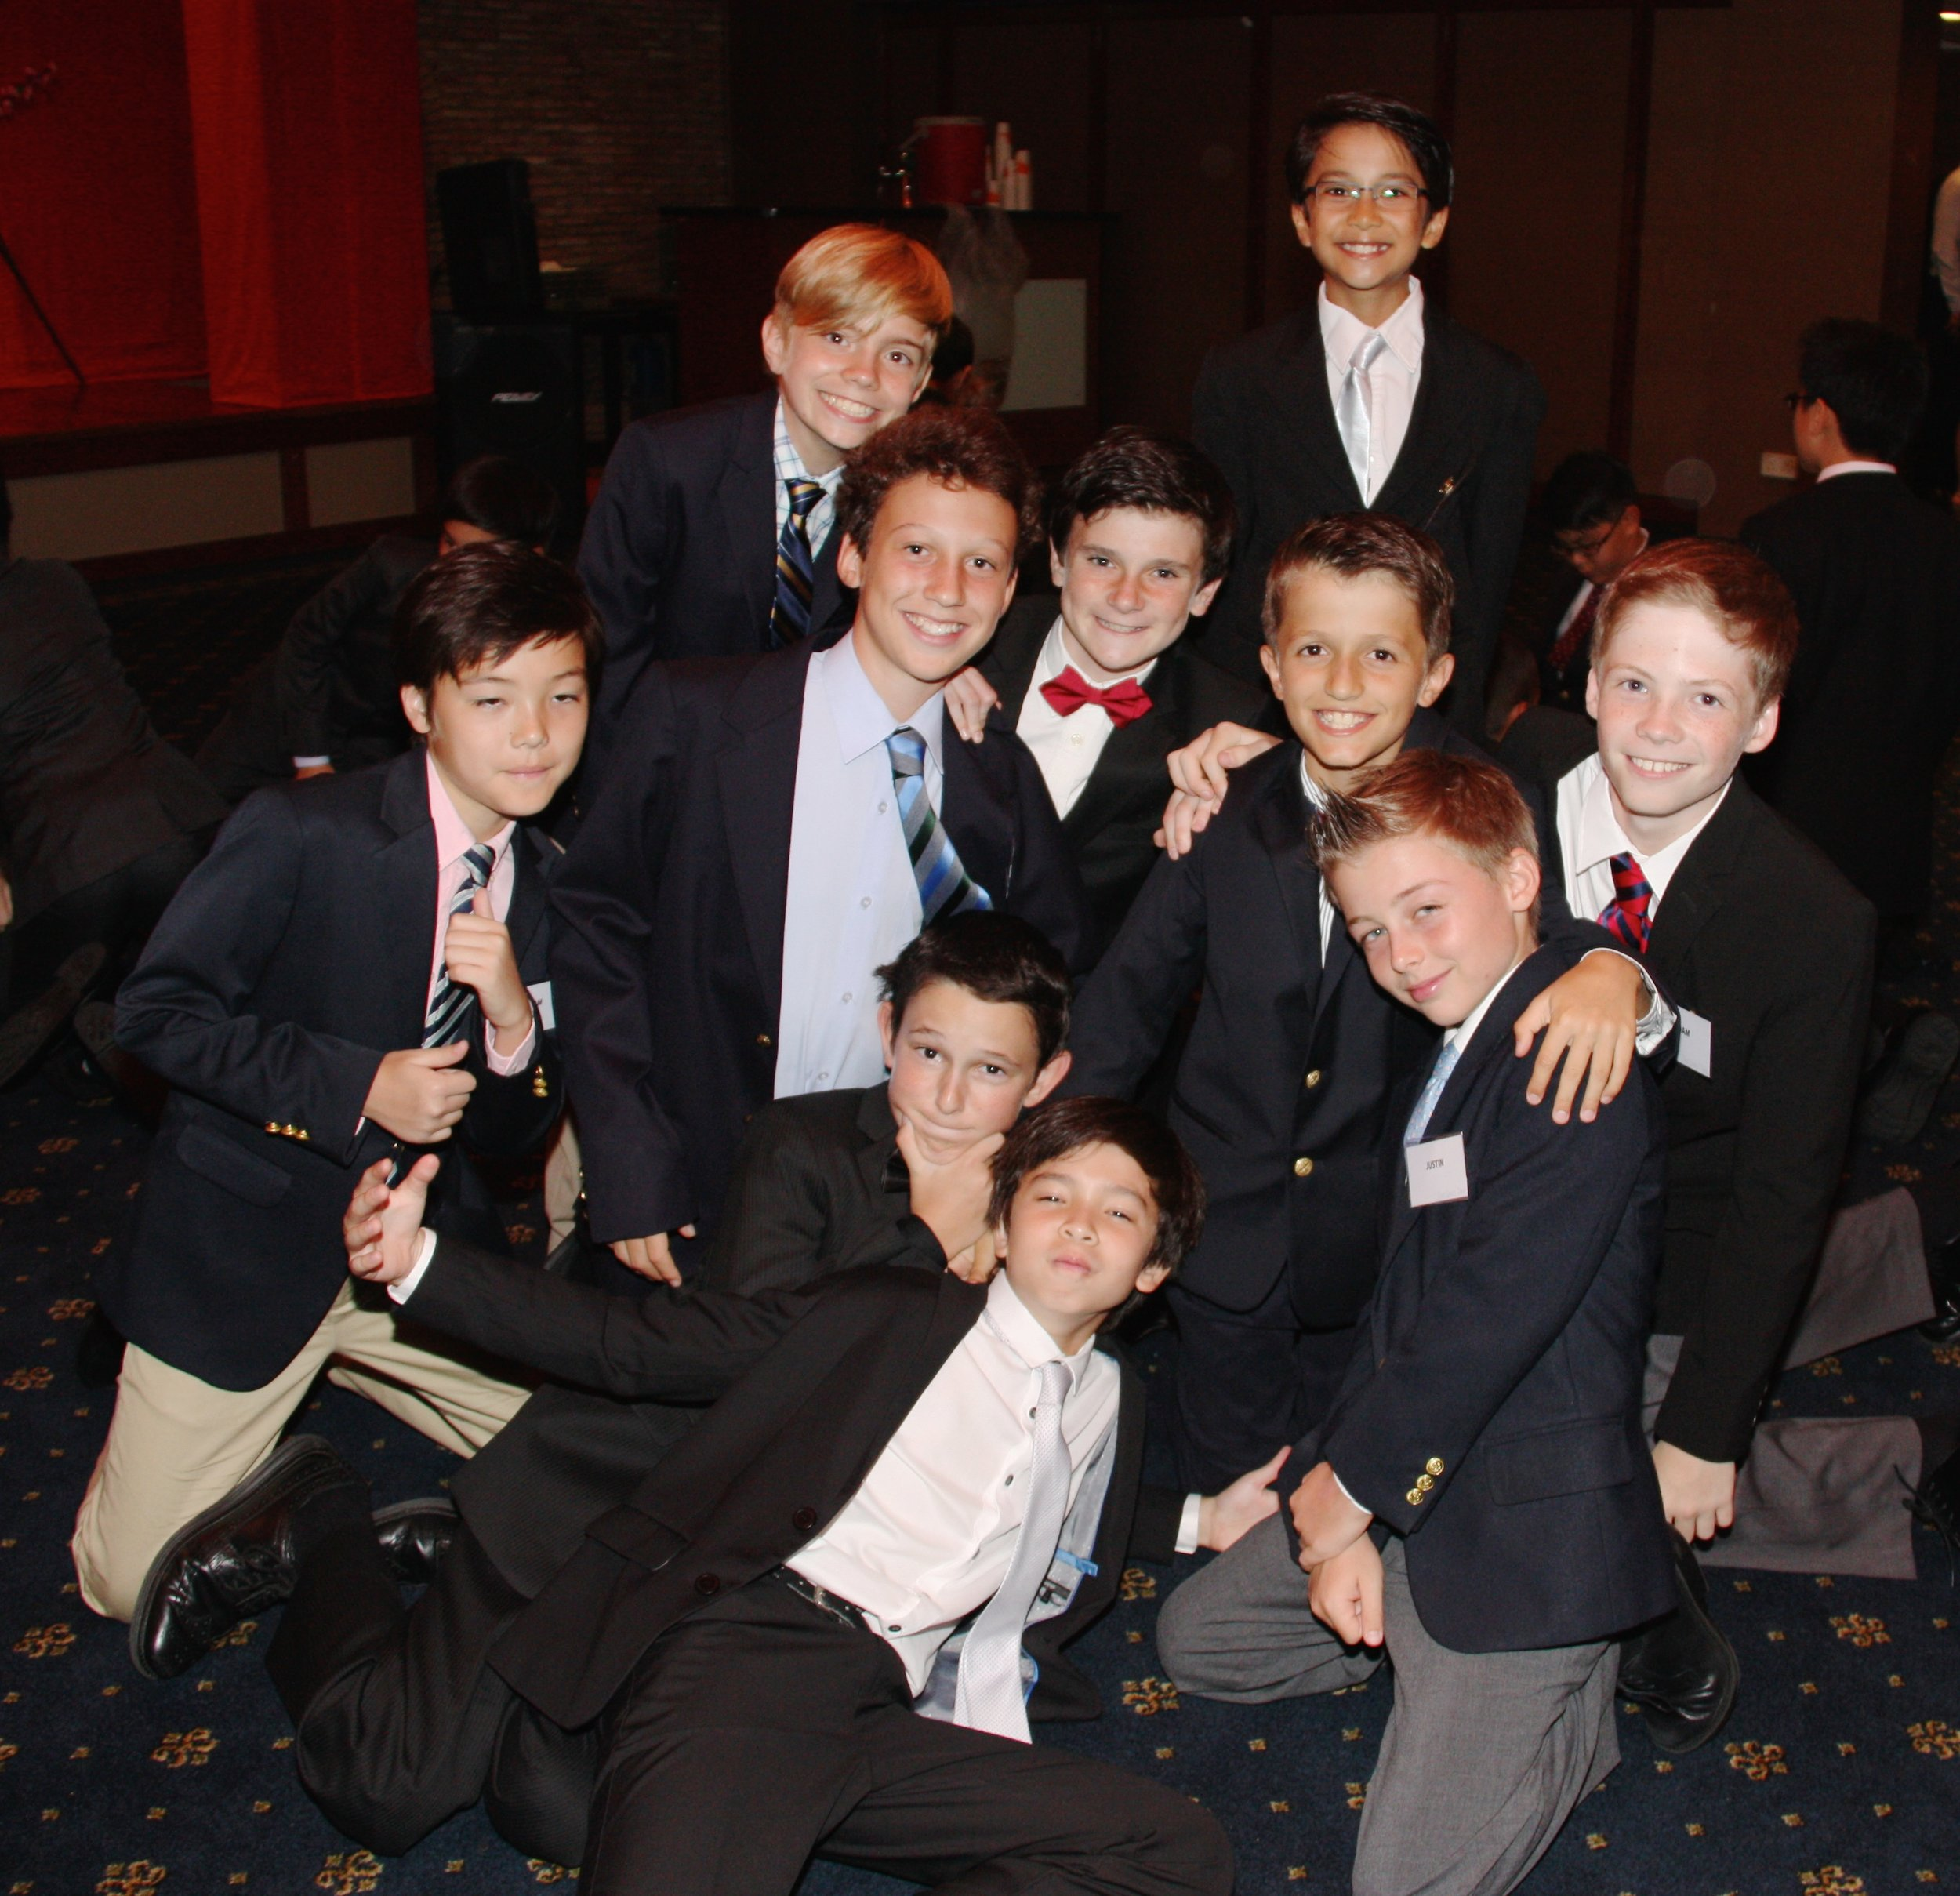 Our 6th Grade boys, dressed to impress.